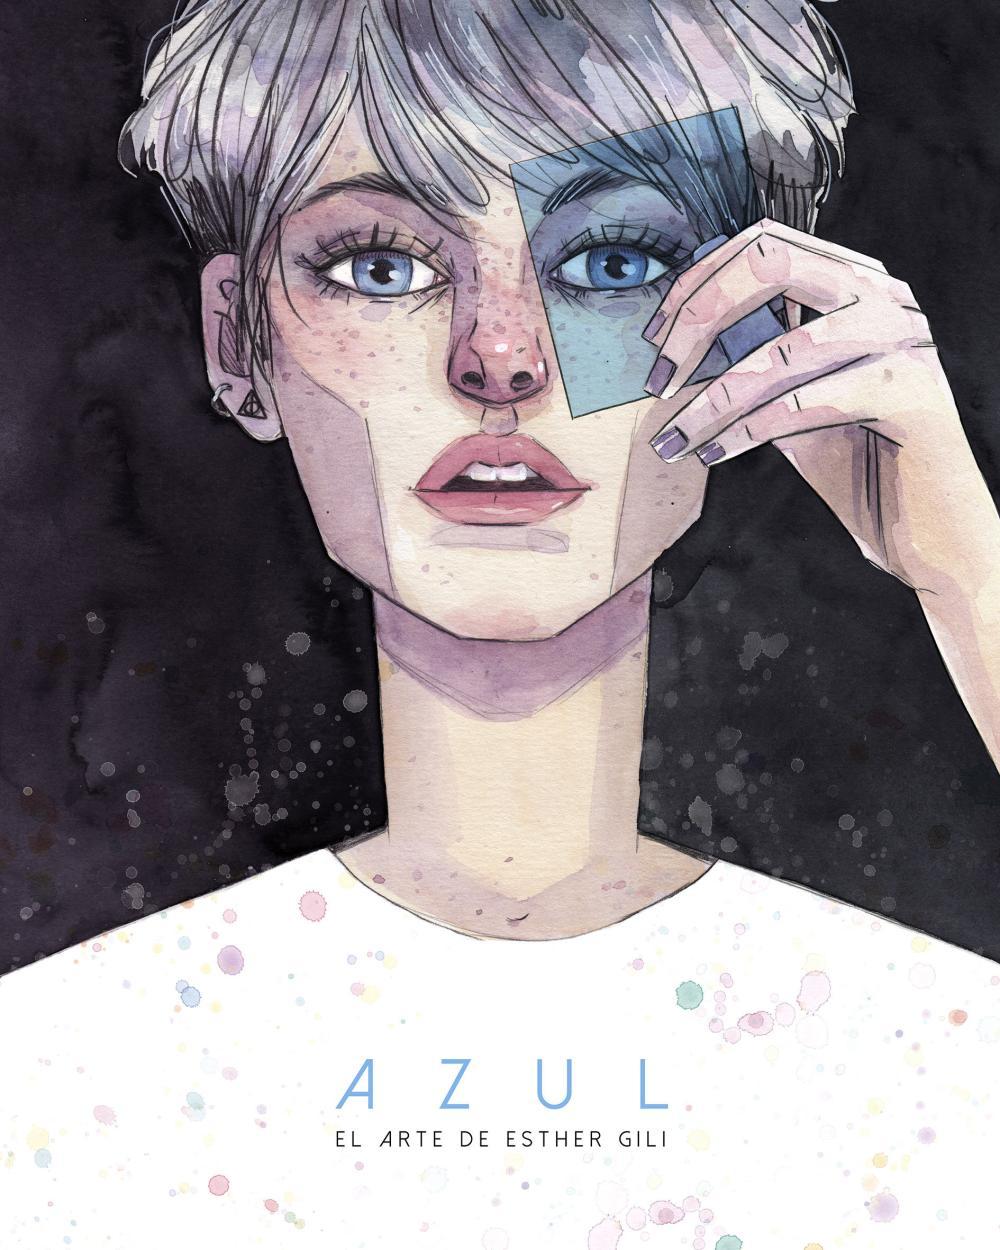 AZUL EL ARTE DE ESTHER GILI